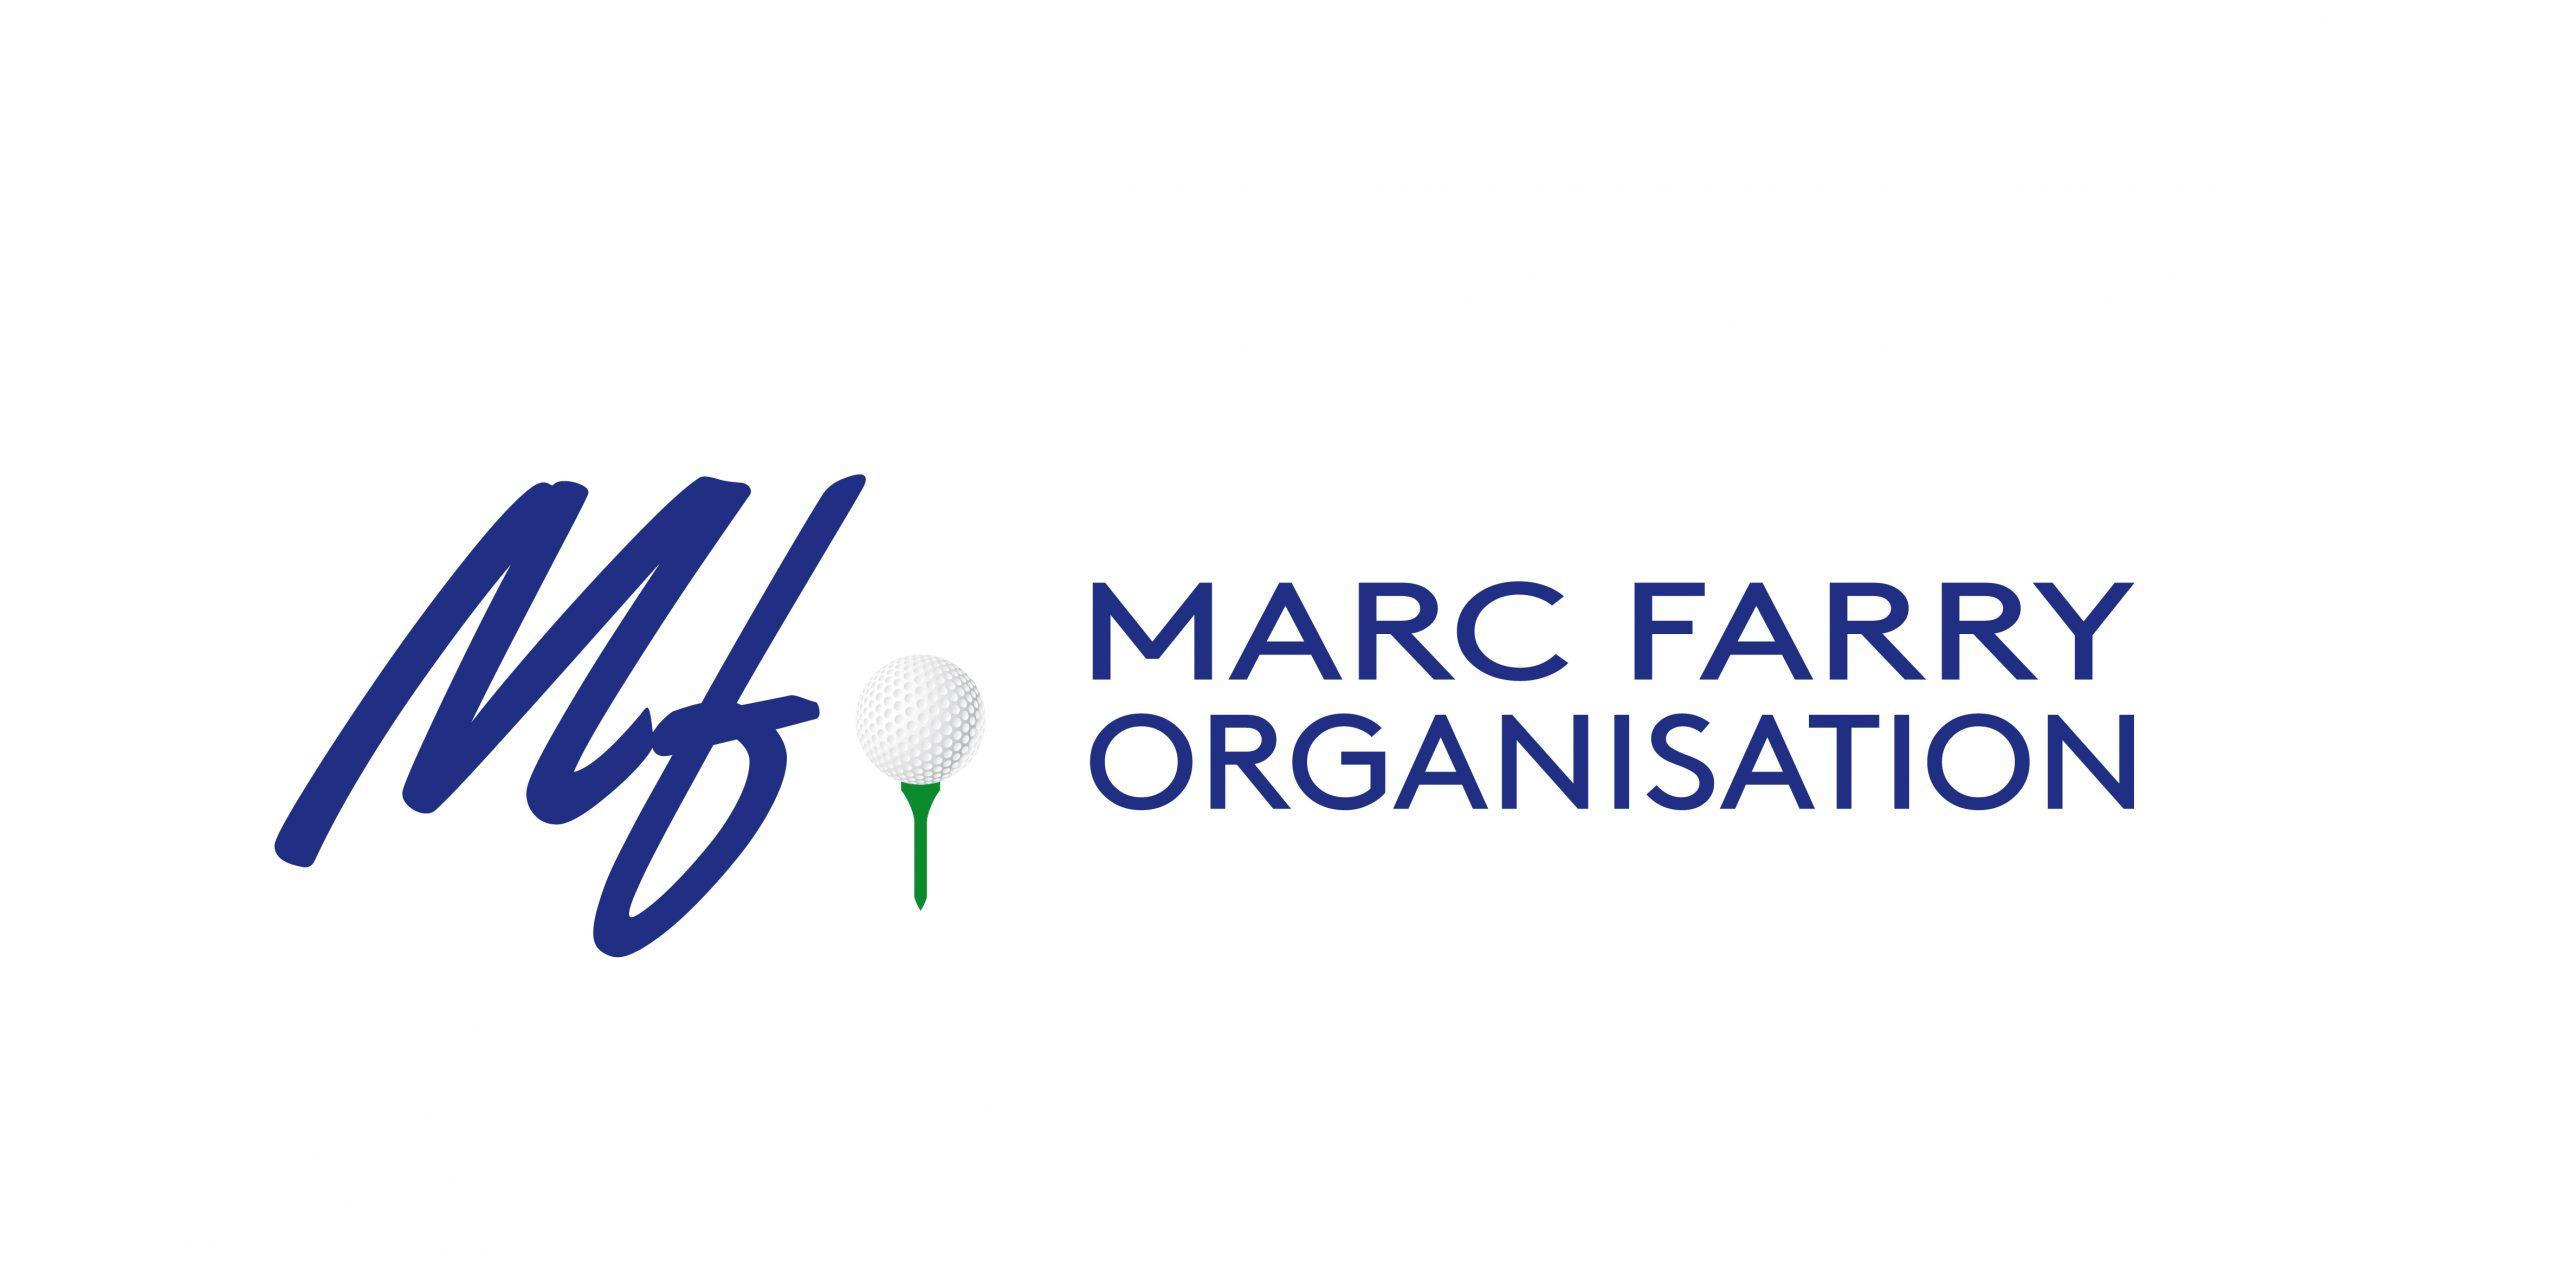 Marc Farry Organisation